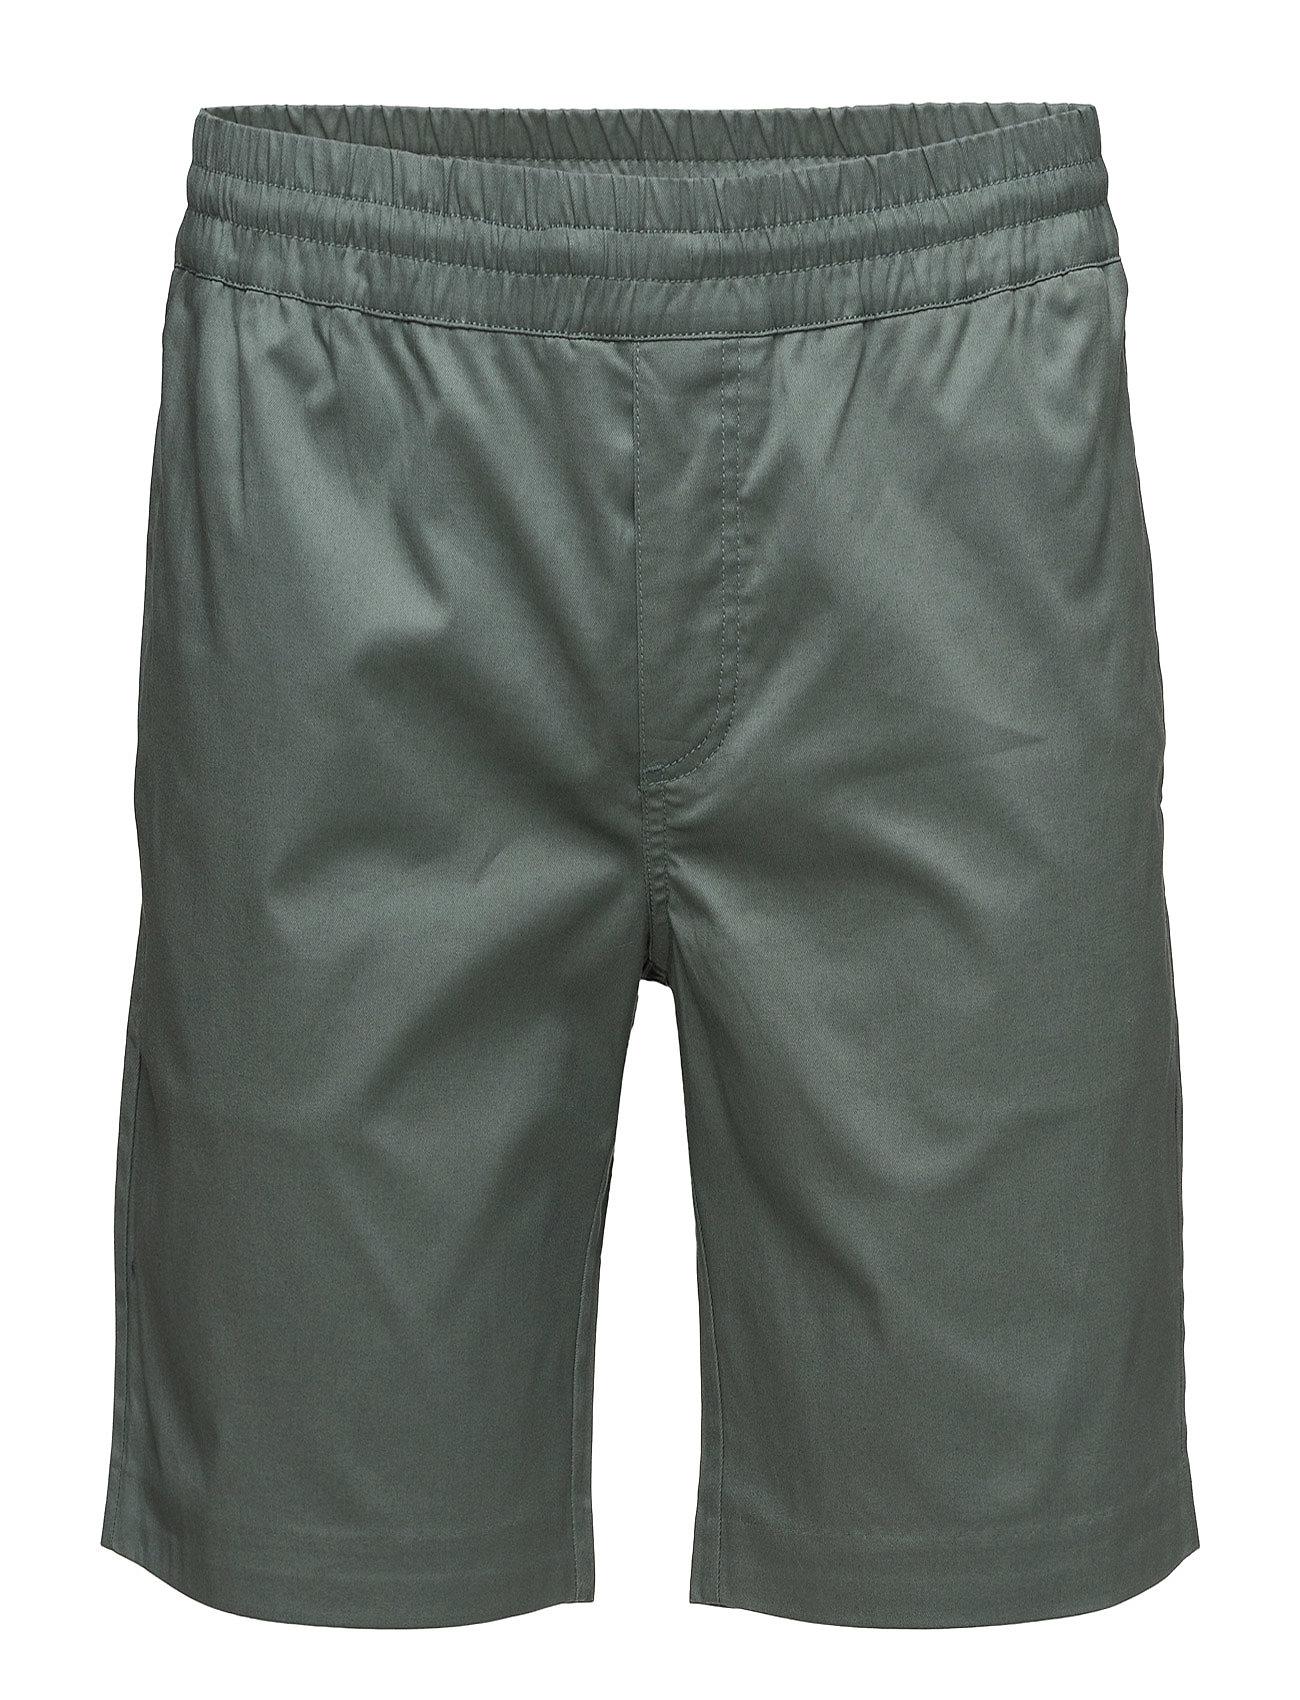 samsã¸e & samsã¸e Smith shorts 8000 fra boozt.com dk